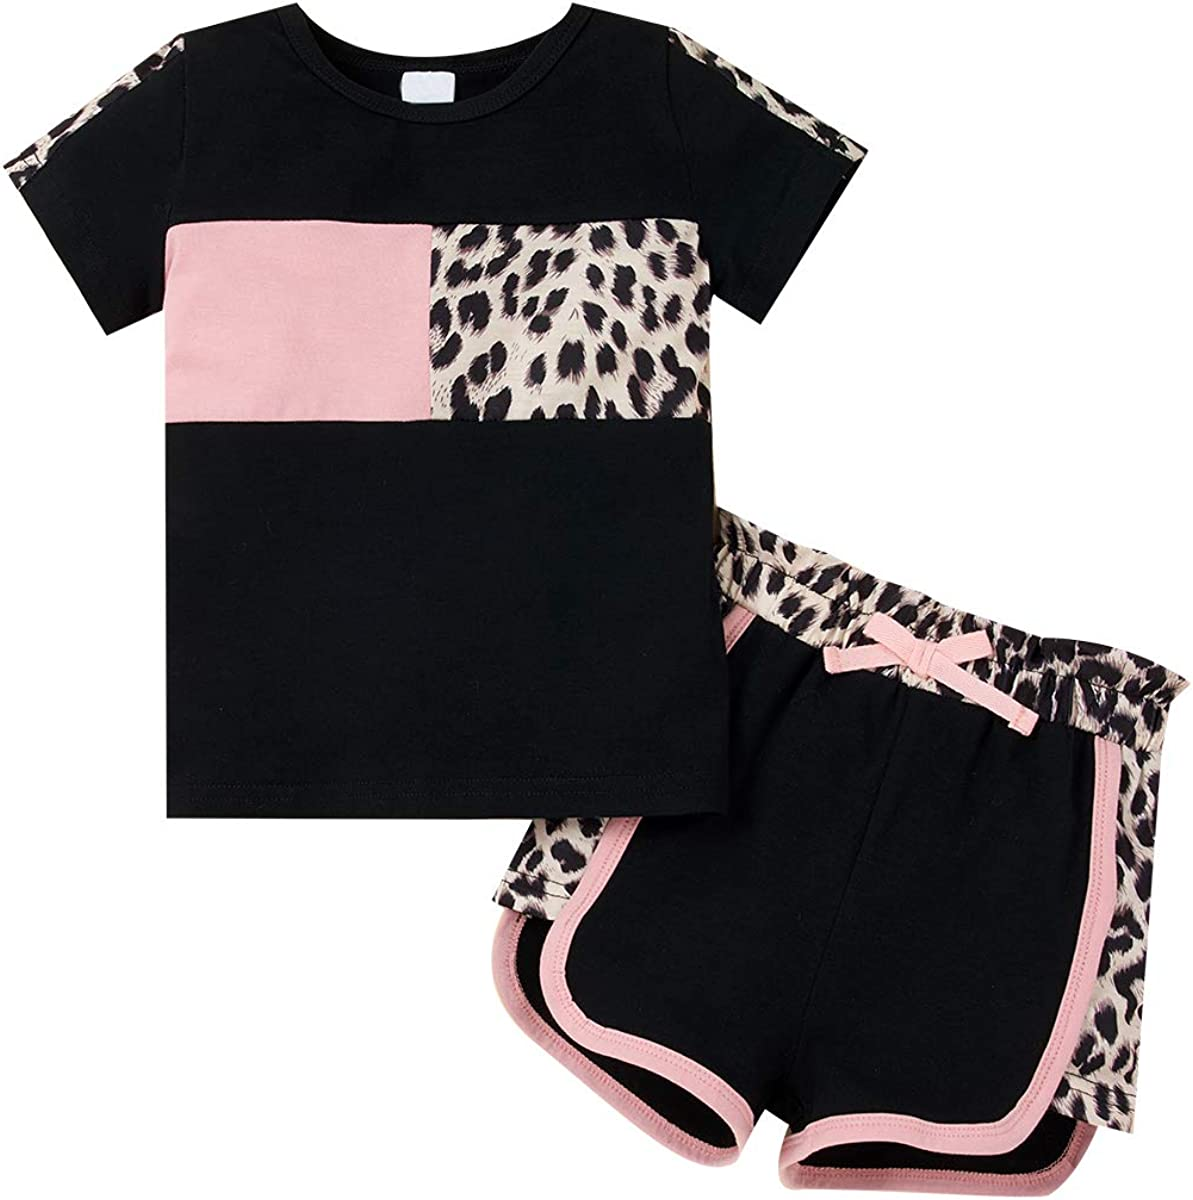 Baby Boys 2Pcs Summer Clothing Sets Cute Animal Print Sleeveless Tank Tops T-Shirt Palm Shorts Outfits